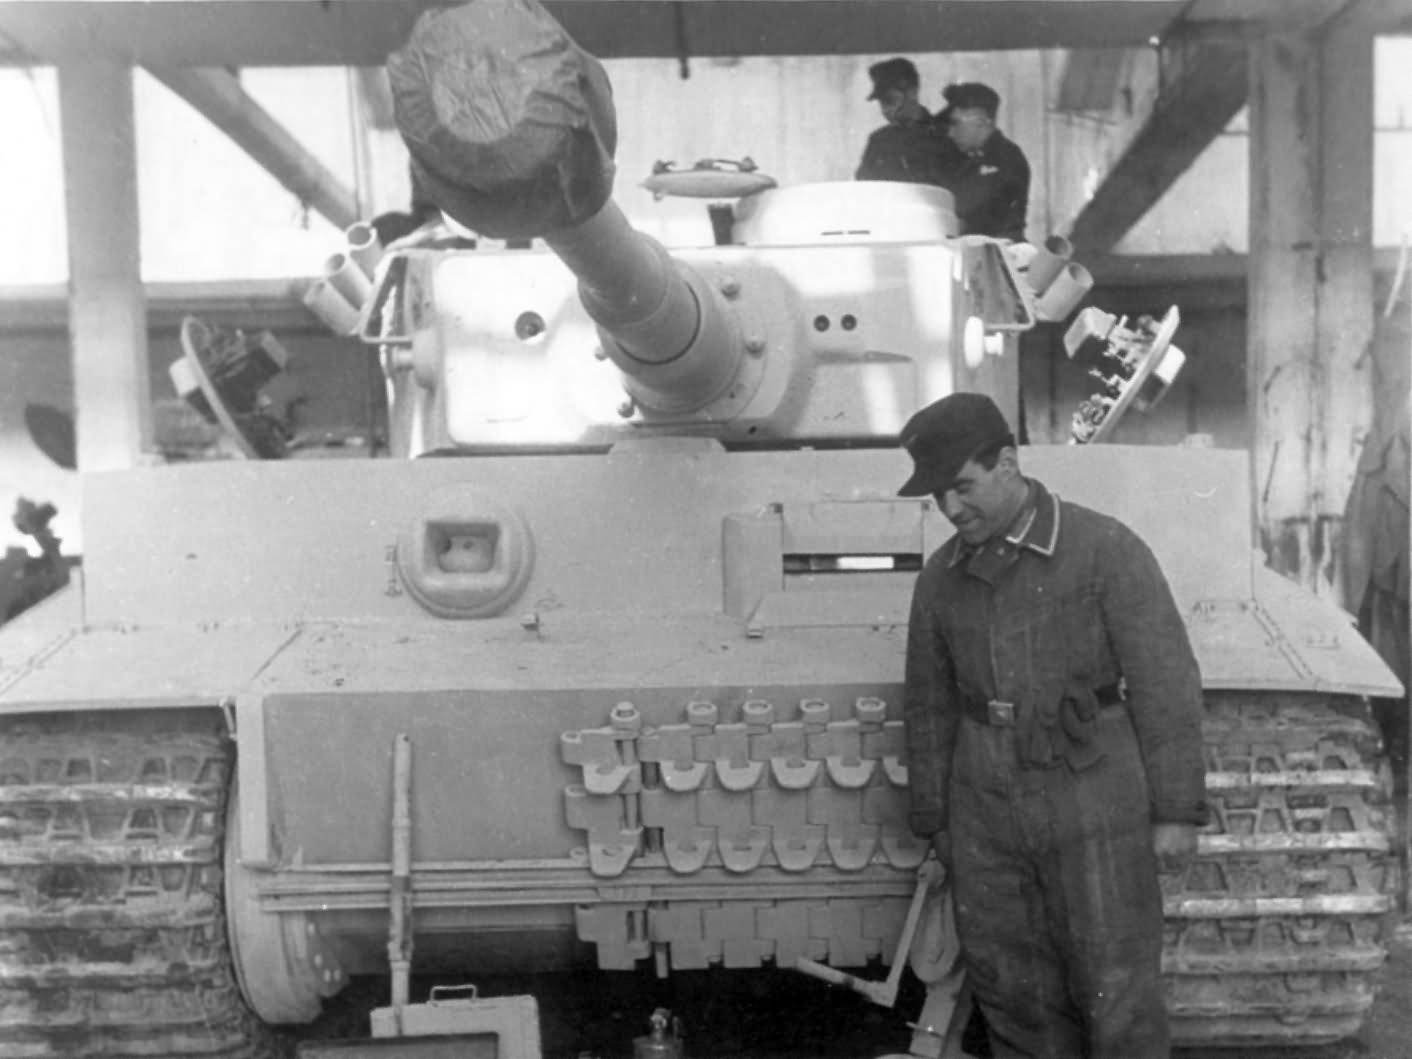 Panzerkampfwagen VI Tiger of Schwere Panzer-Abteilung 505